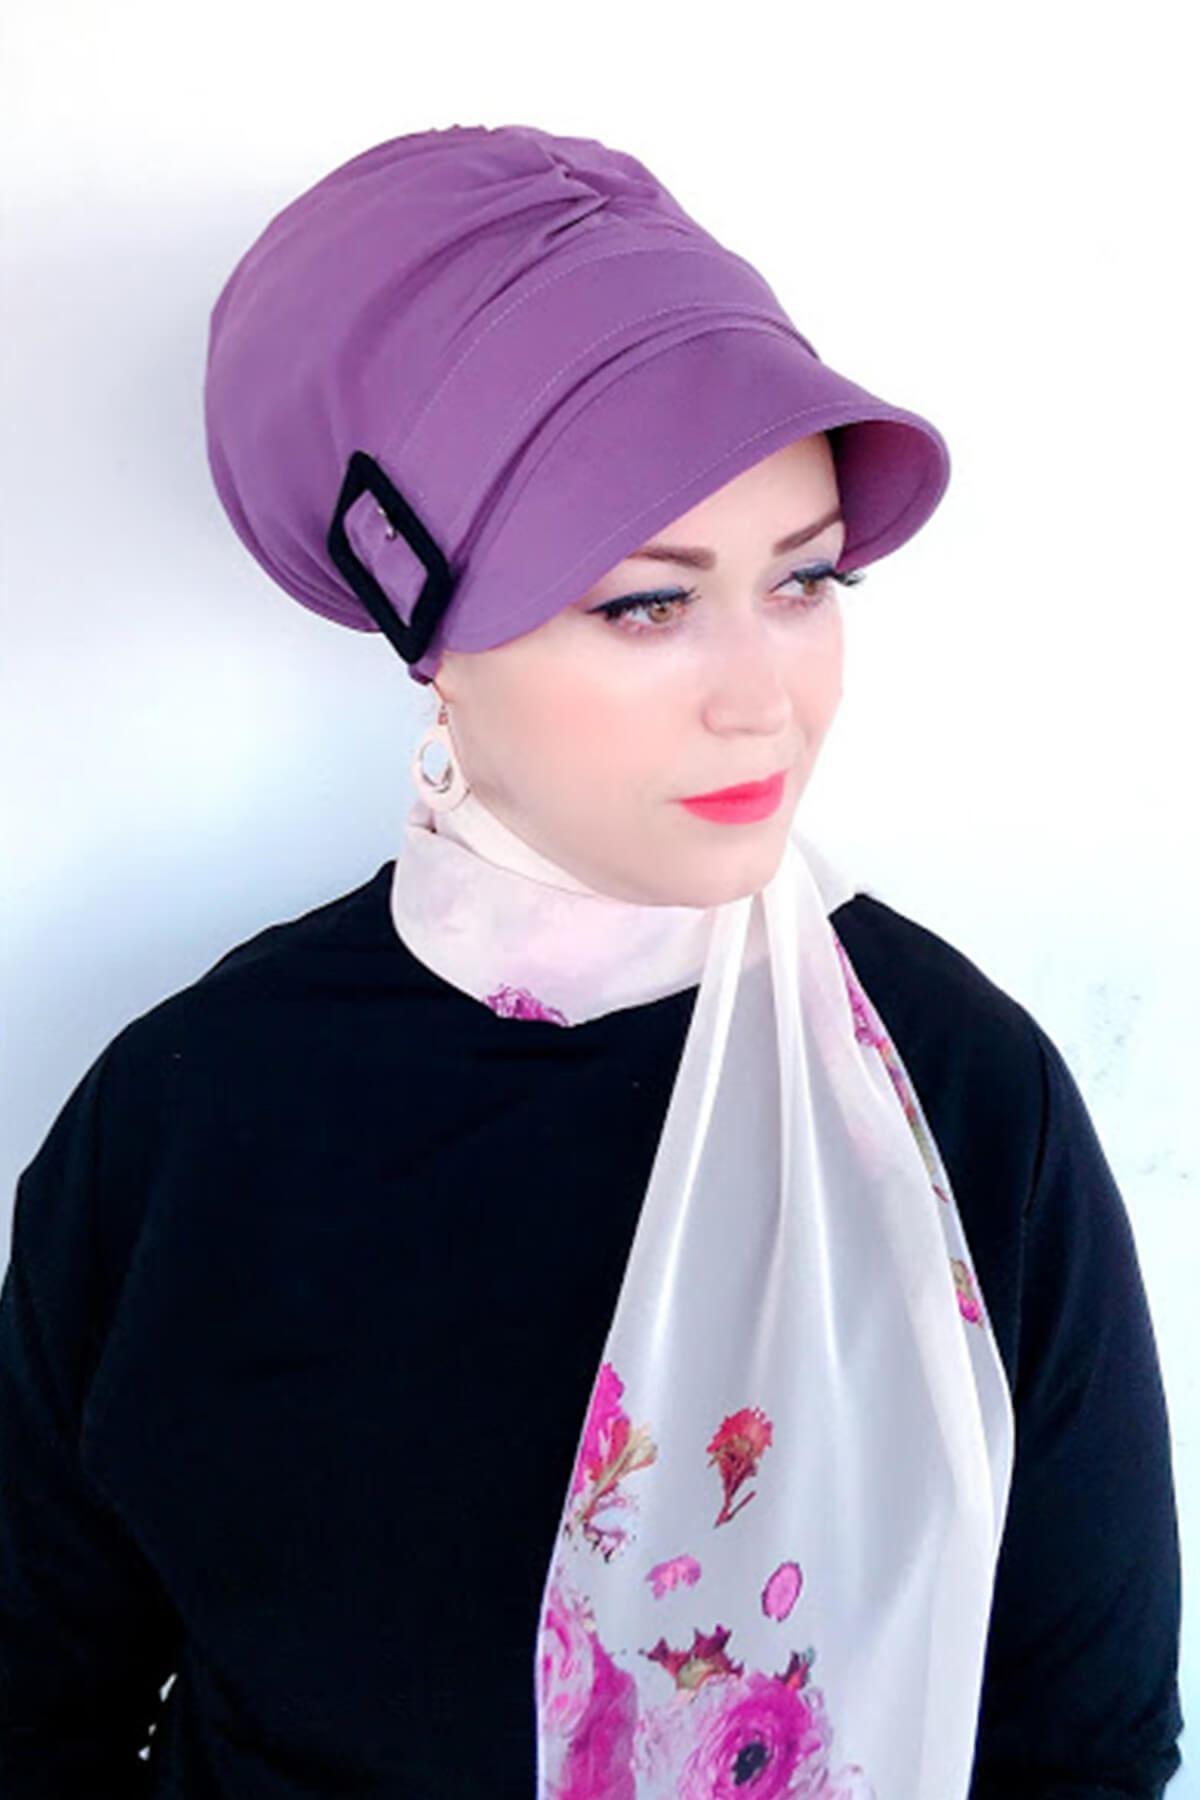 Lila Rengi Siyah Tokalı Şapka